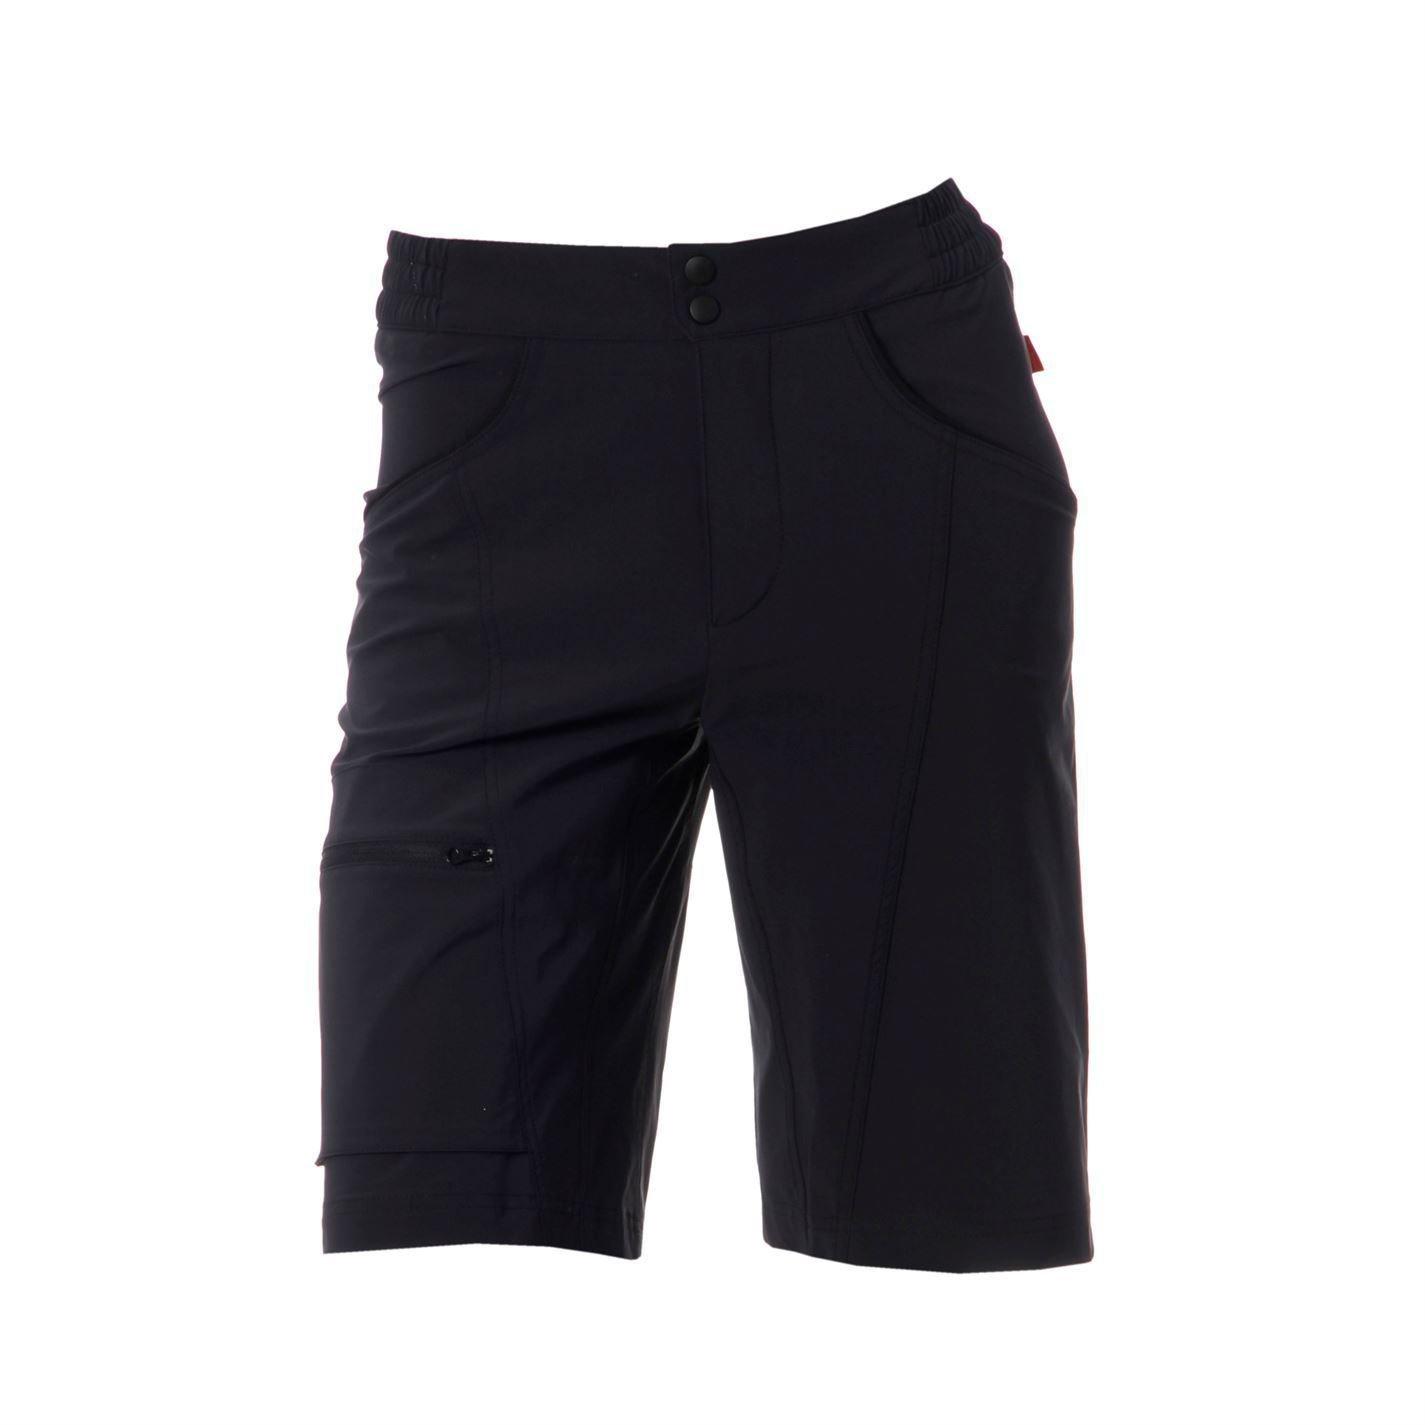 Löffler Mens Bike Shorts Cycle Cycling Sports Pants Bottoms Sportswear